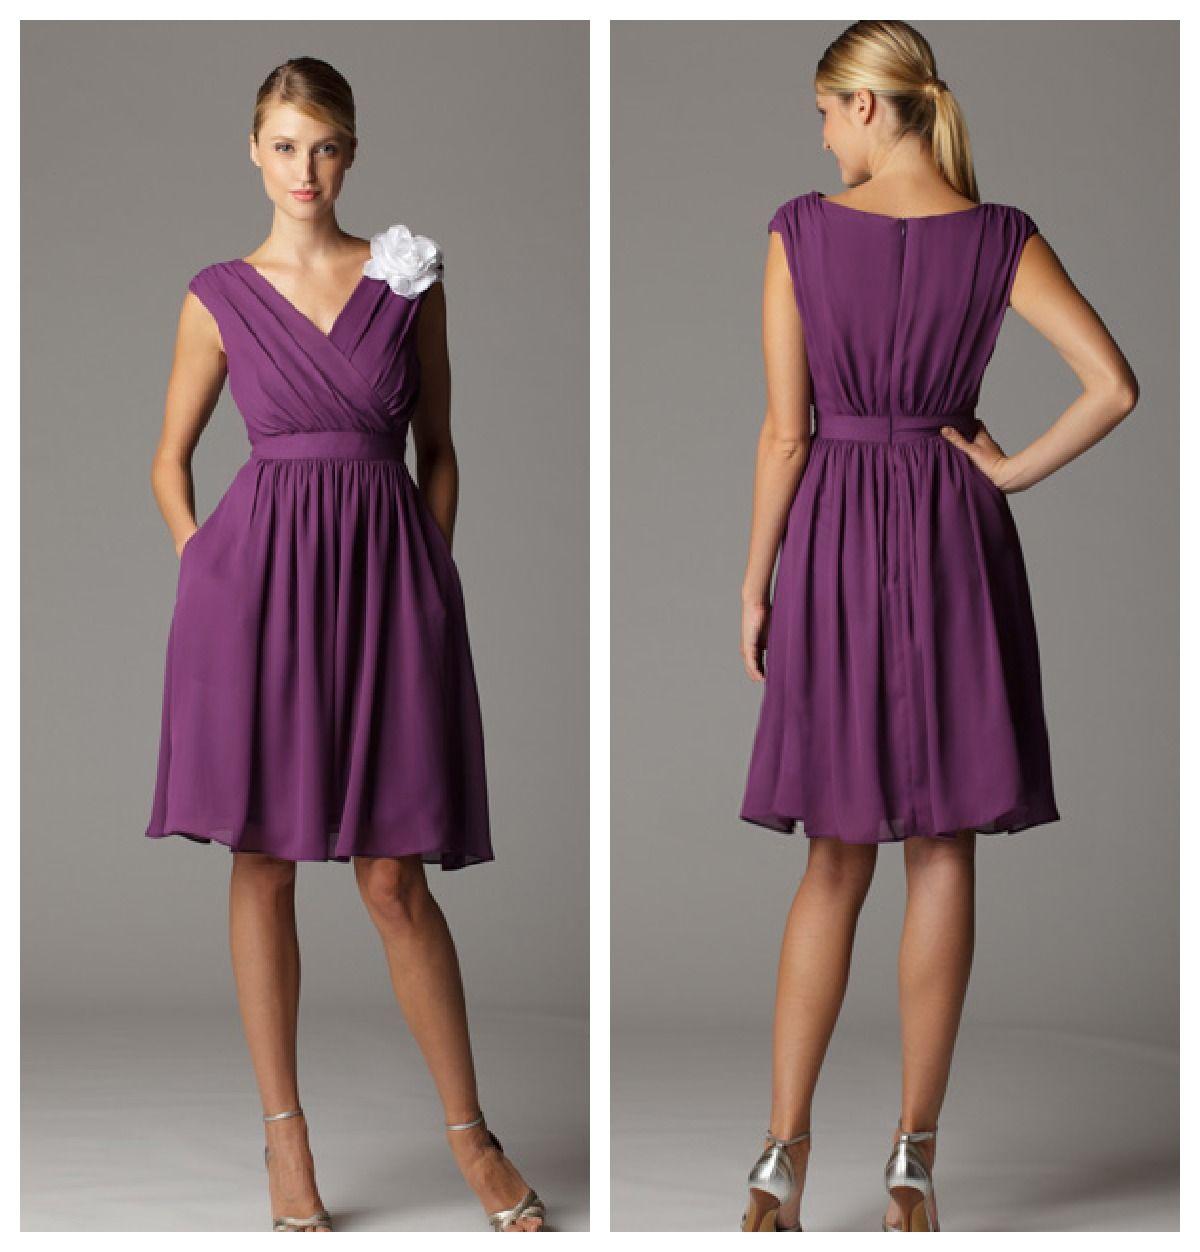 Purple Bridesmaid Dresses Wedding Advice Rustic Country